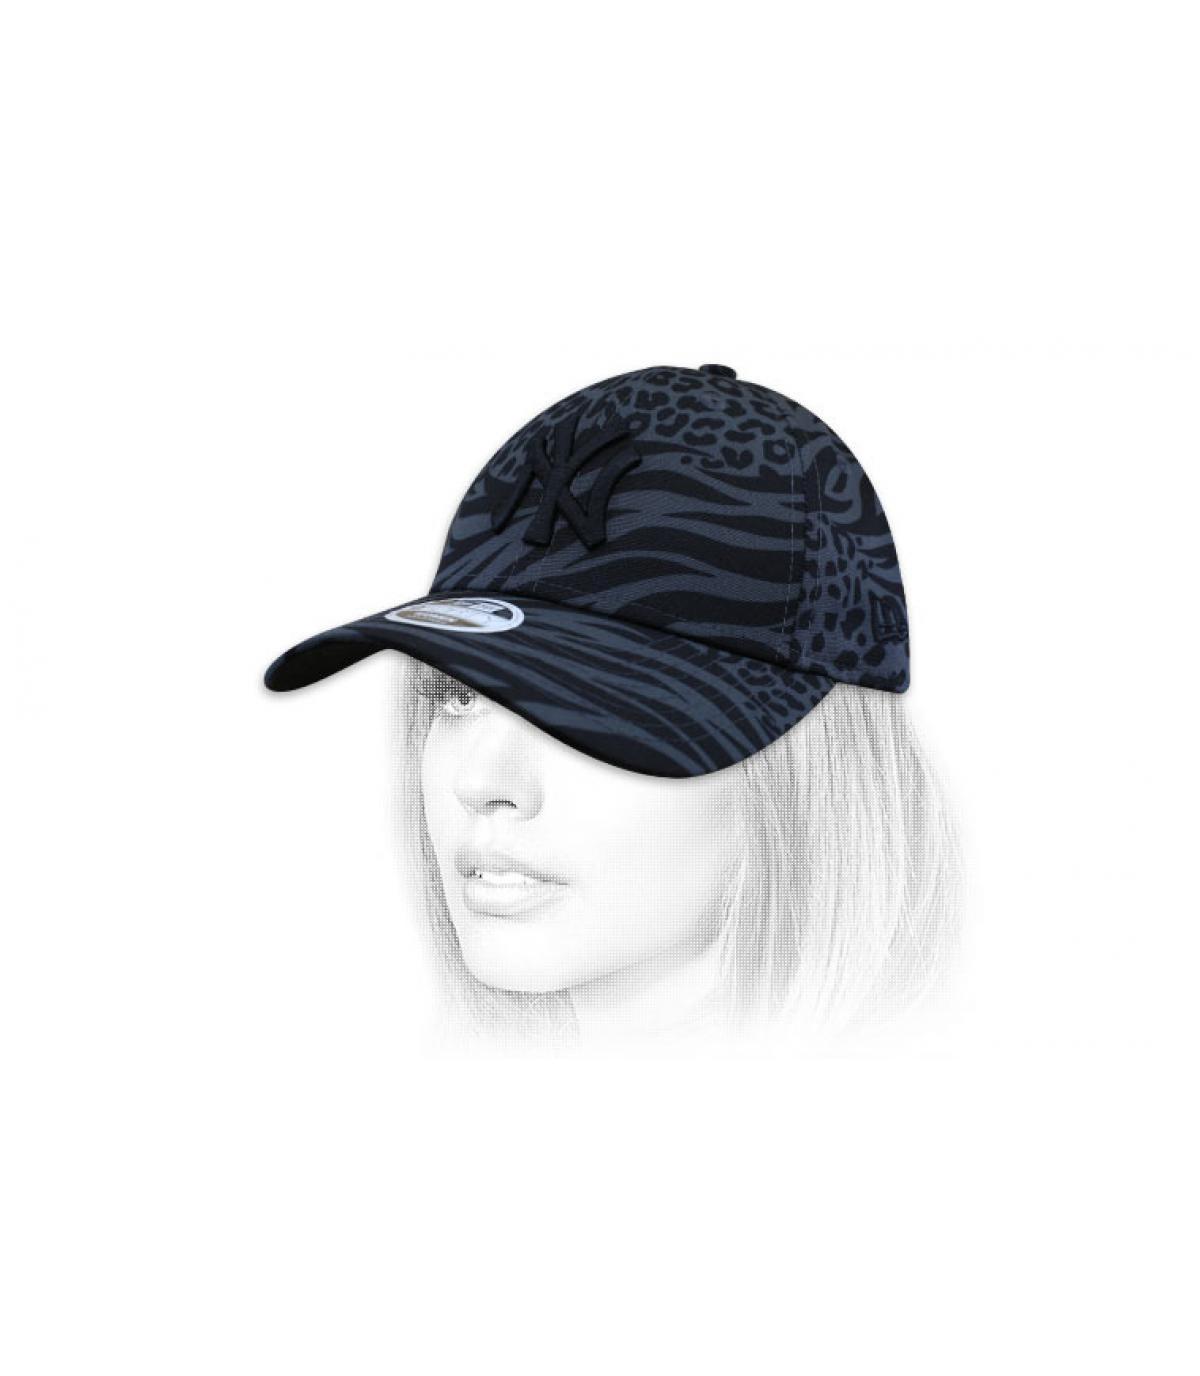 Damen Cap NY bedruckt